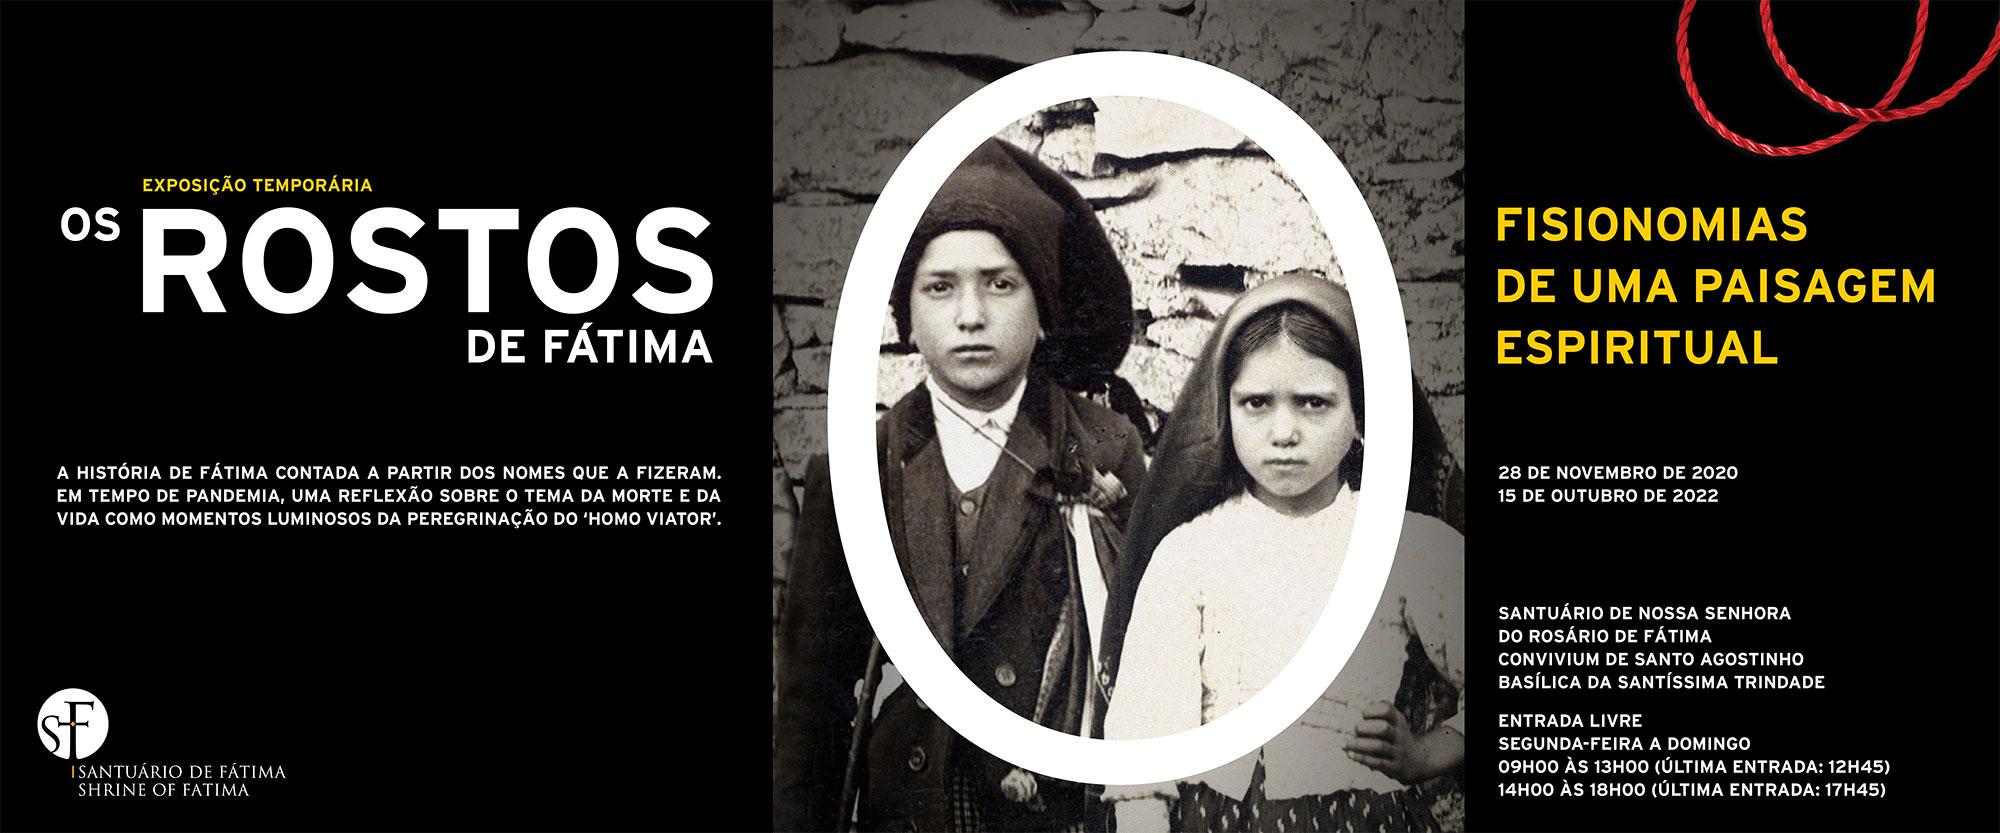 2020-11-17_Noticia_EXPO_Rostos_de_Fatima_2.jpg